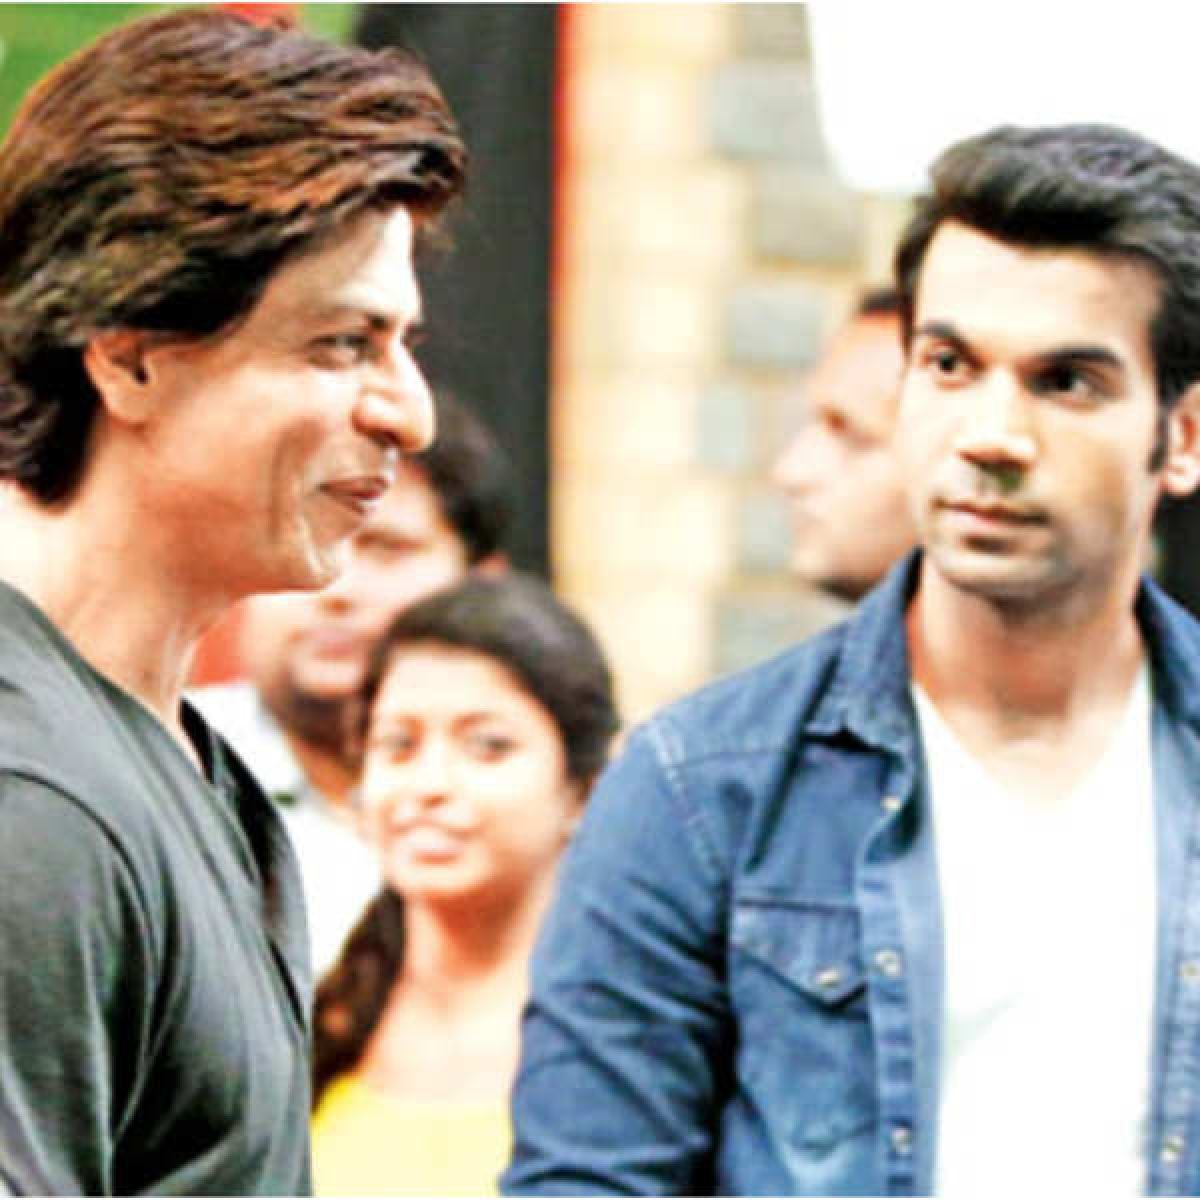 When real Raj met reel Raj: Shah Rukh Khan kisses his super fan Rajkummar Rao